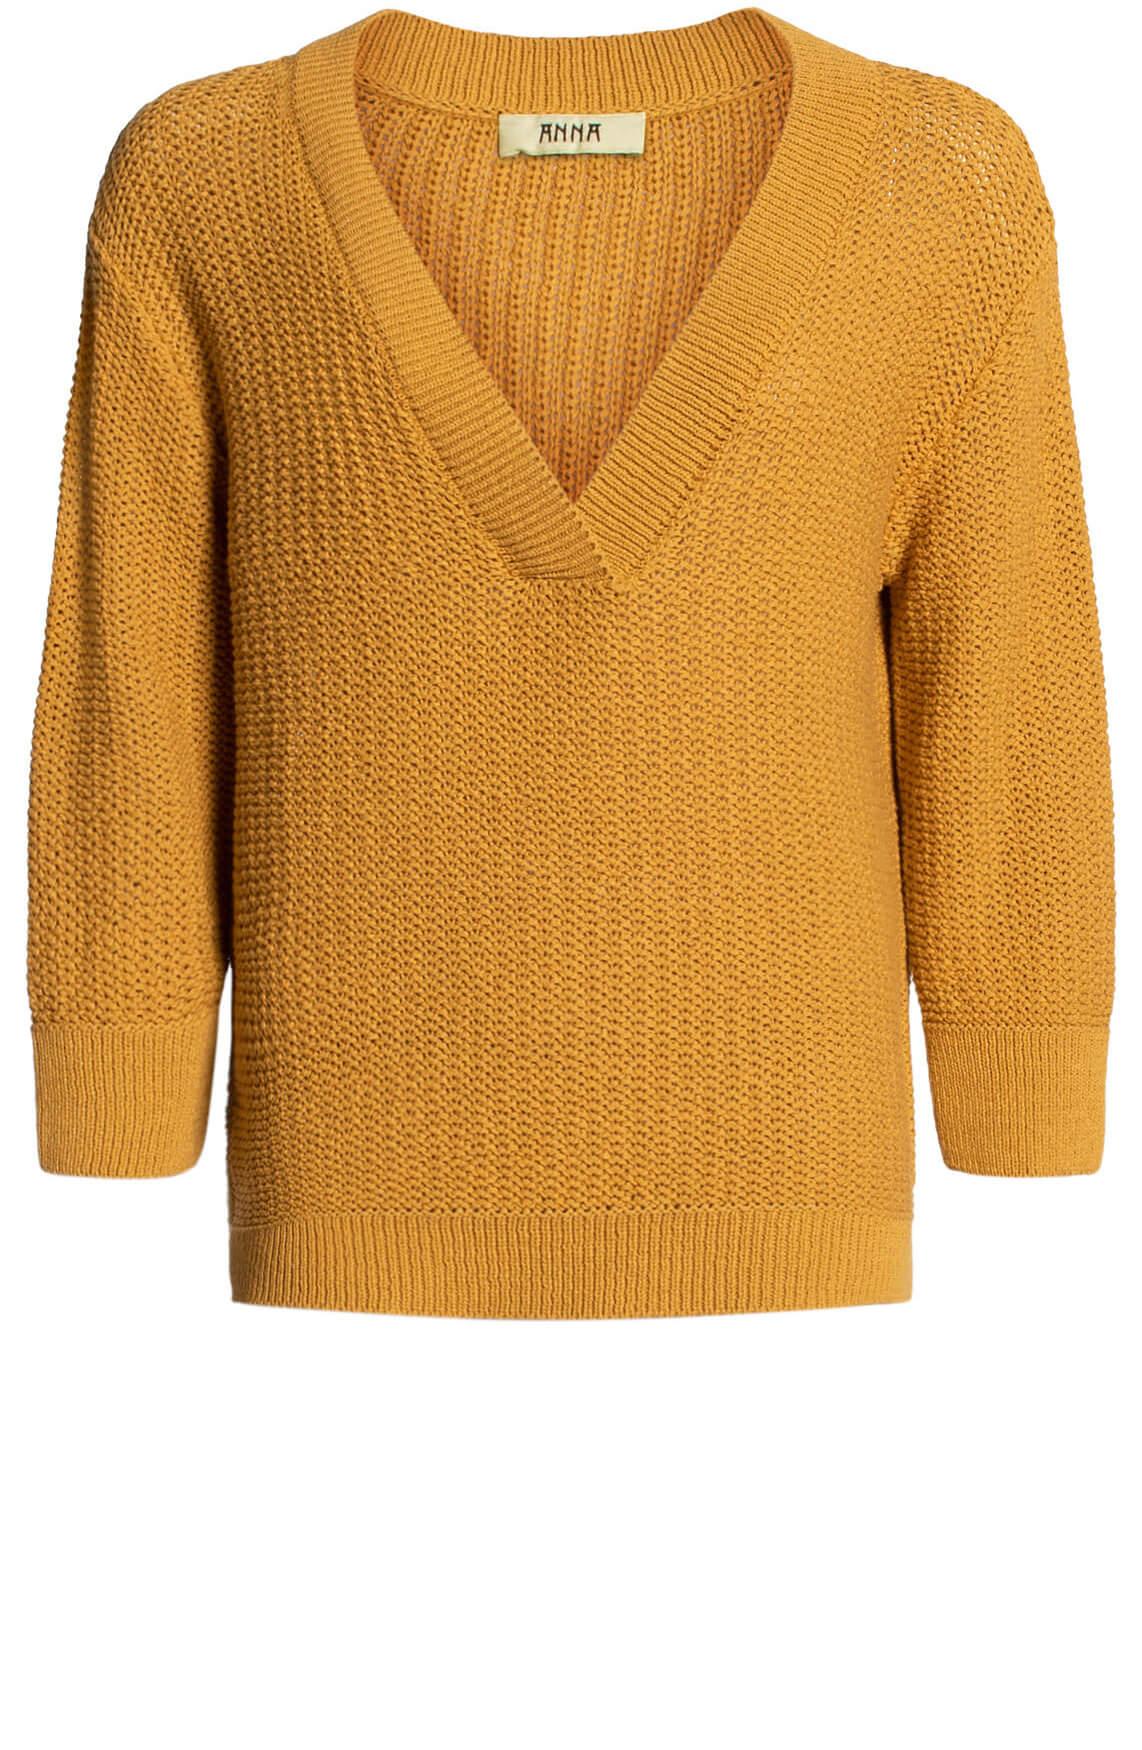 Anna Blue Dames V-hals pullover geel